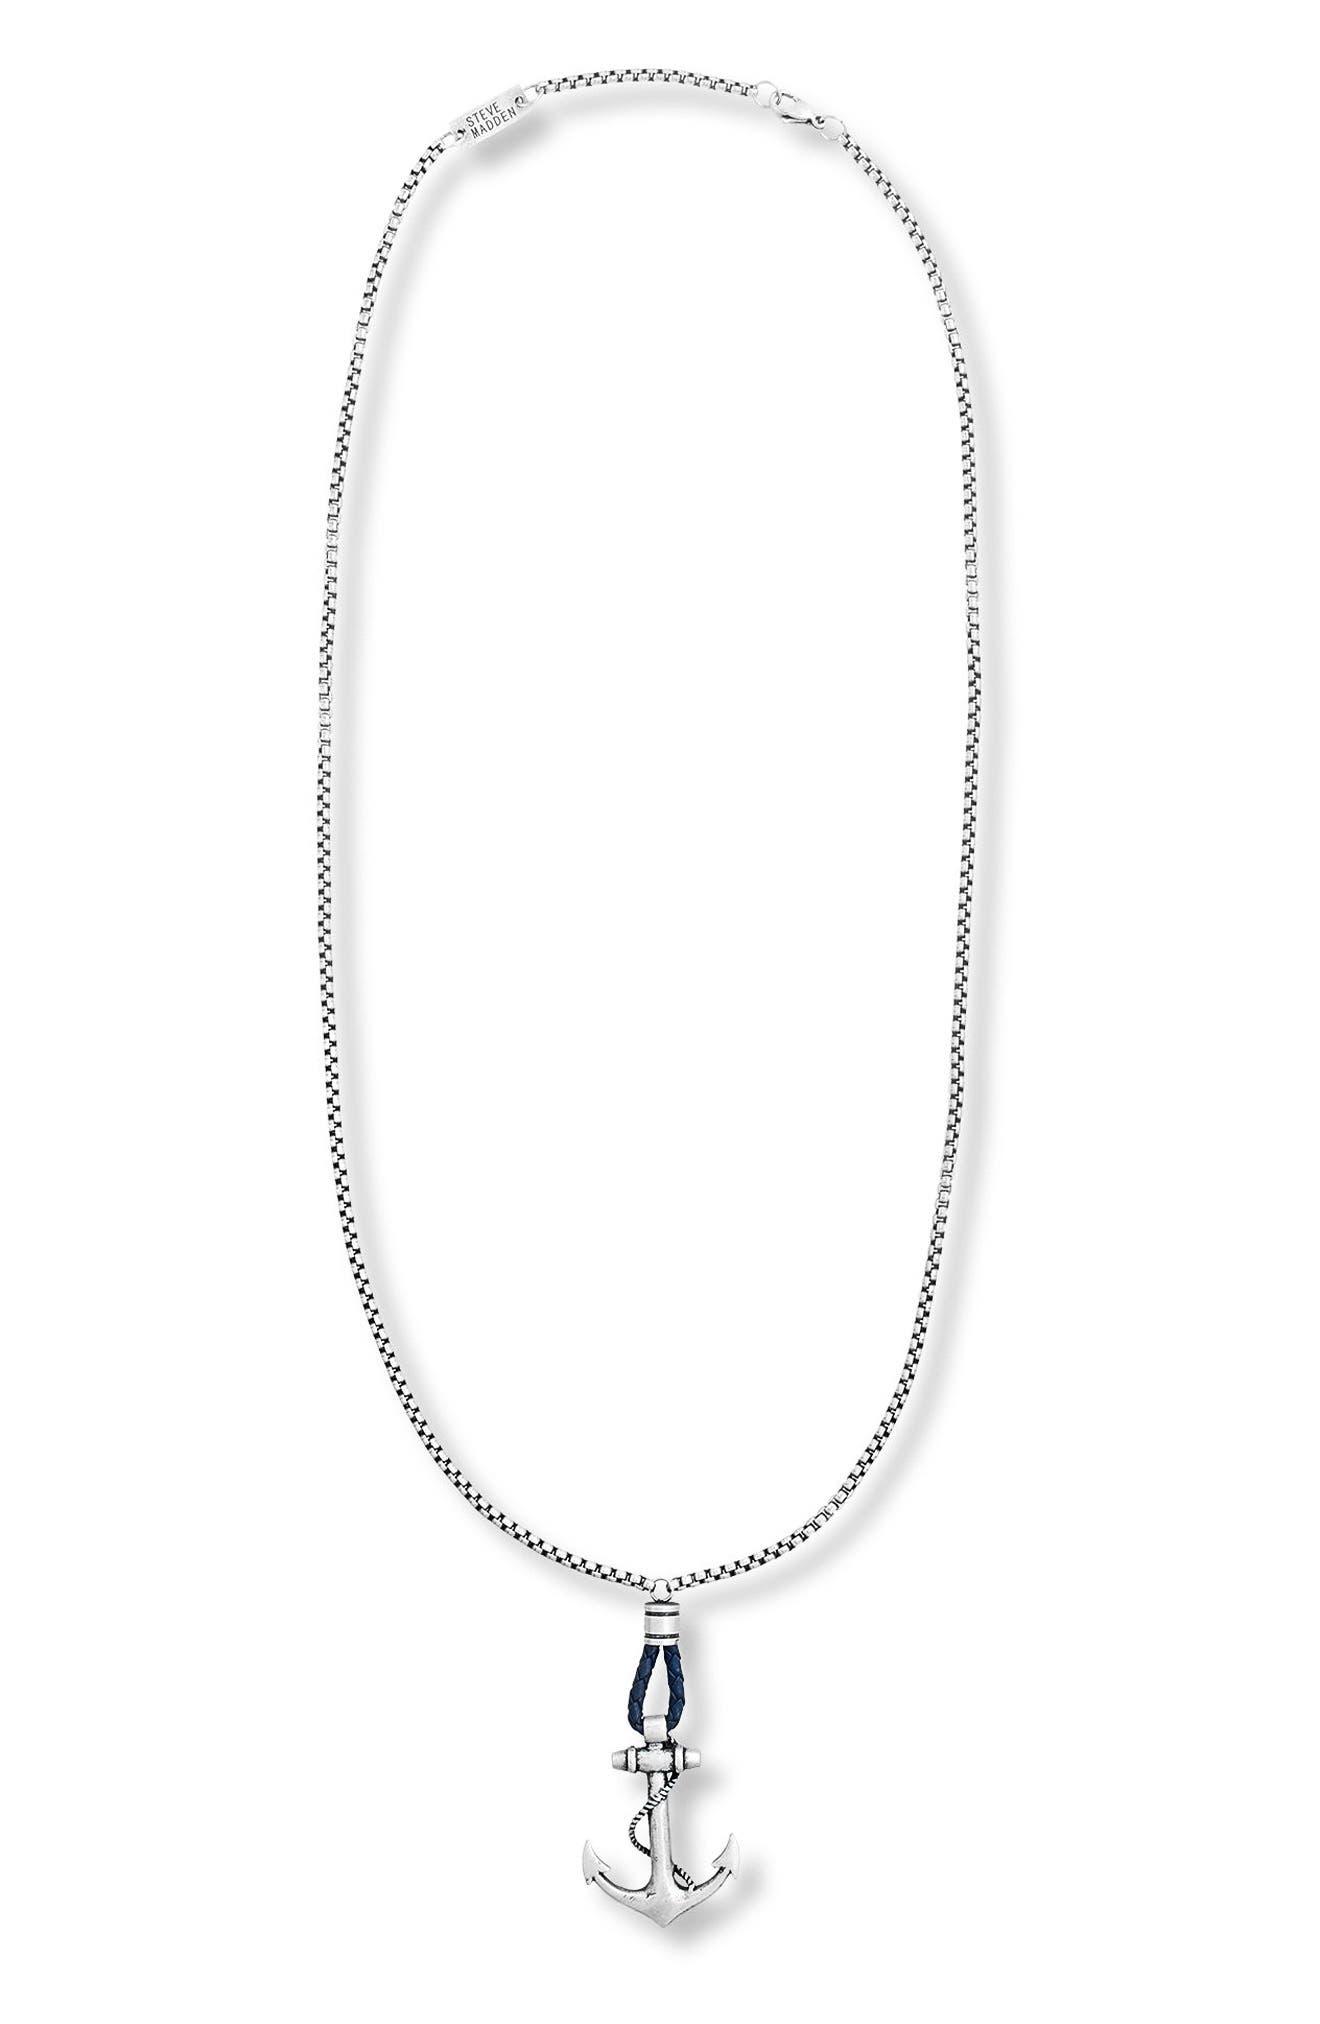 Steve Madden Oxidized Anchor Pendant Necklace